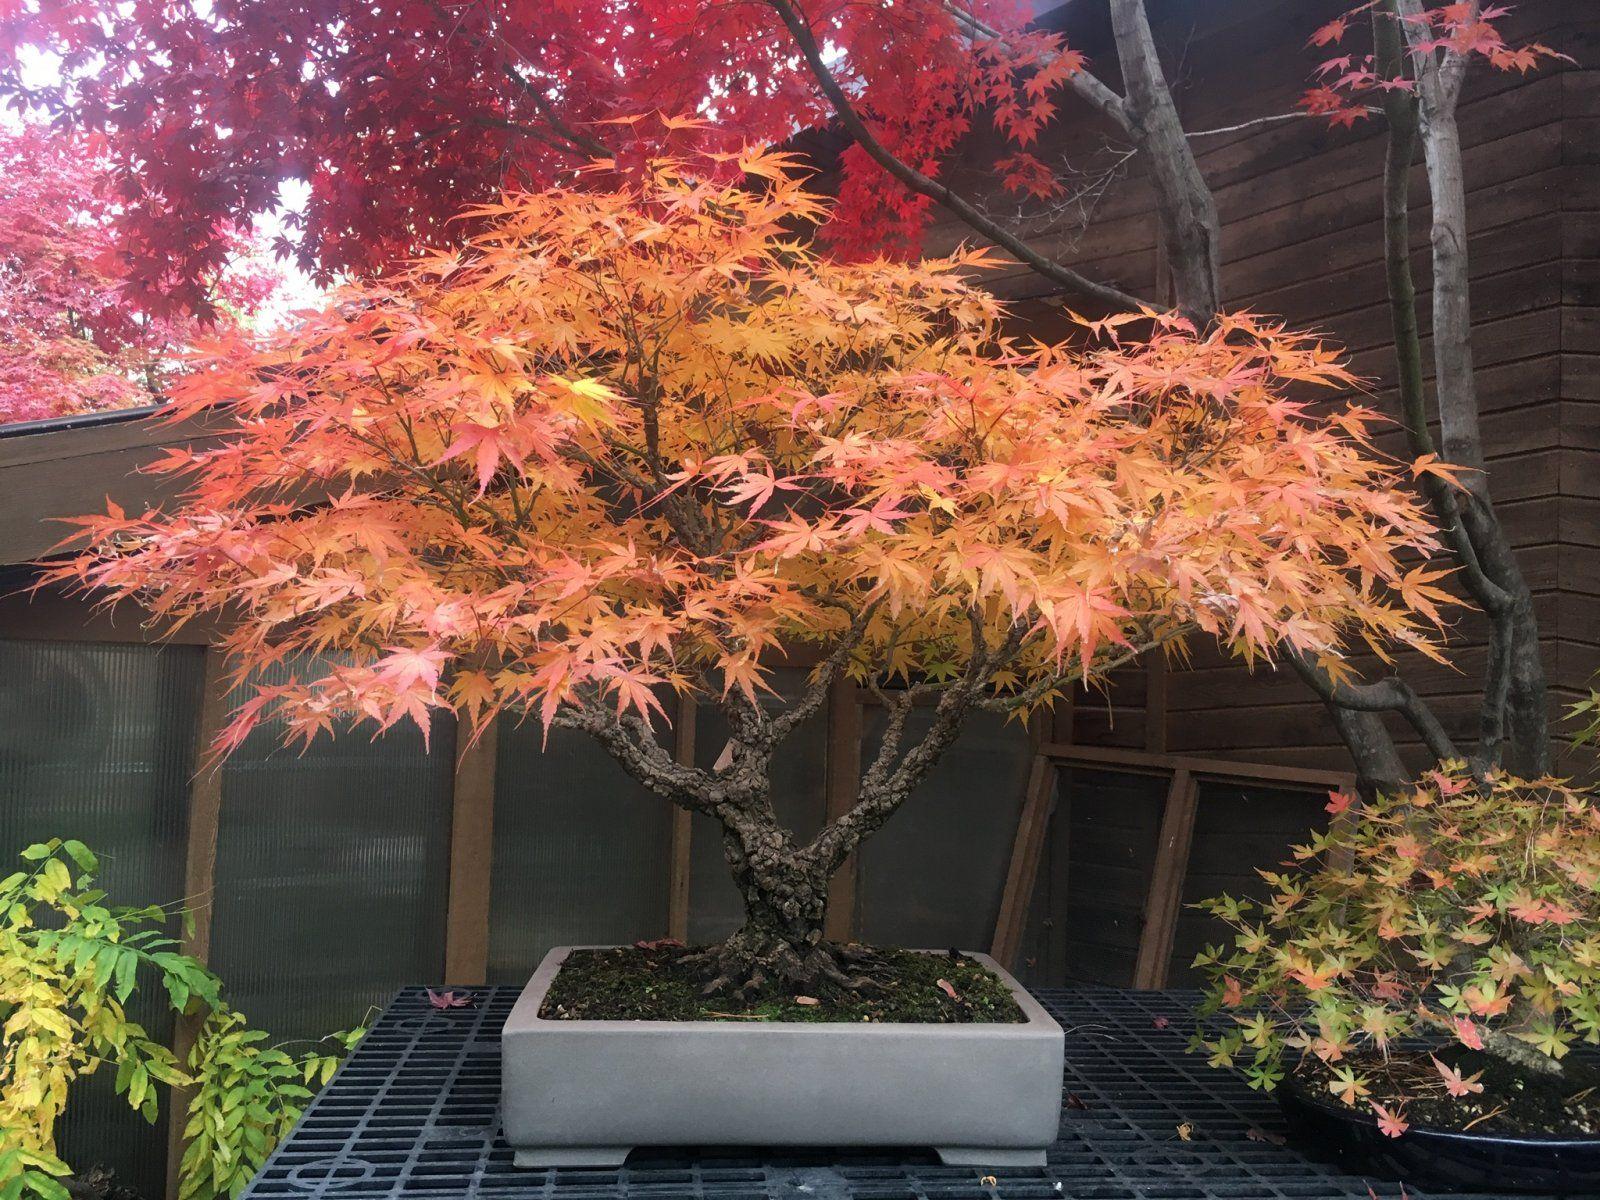 50 ORANGE DREAM JAPANESE MAPLE LACELEAF TREES  SEEDS ORNAMENTAL TRESS  BONSAI